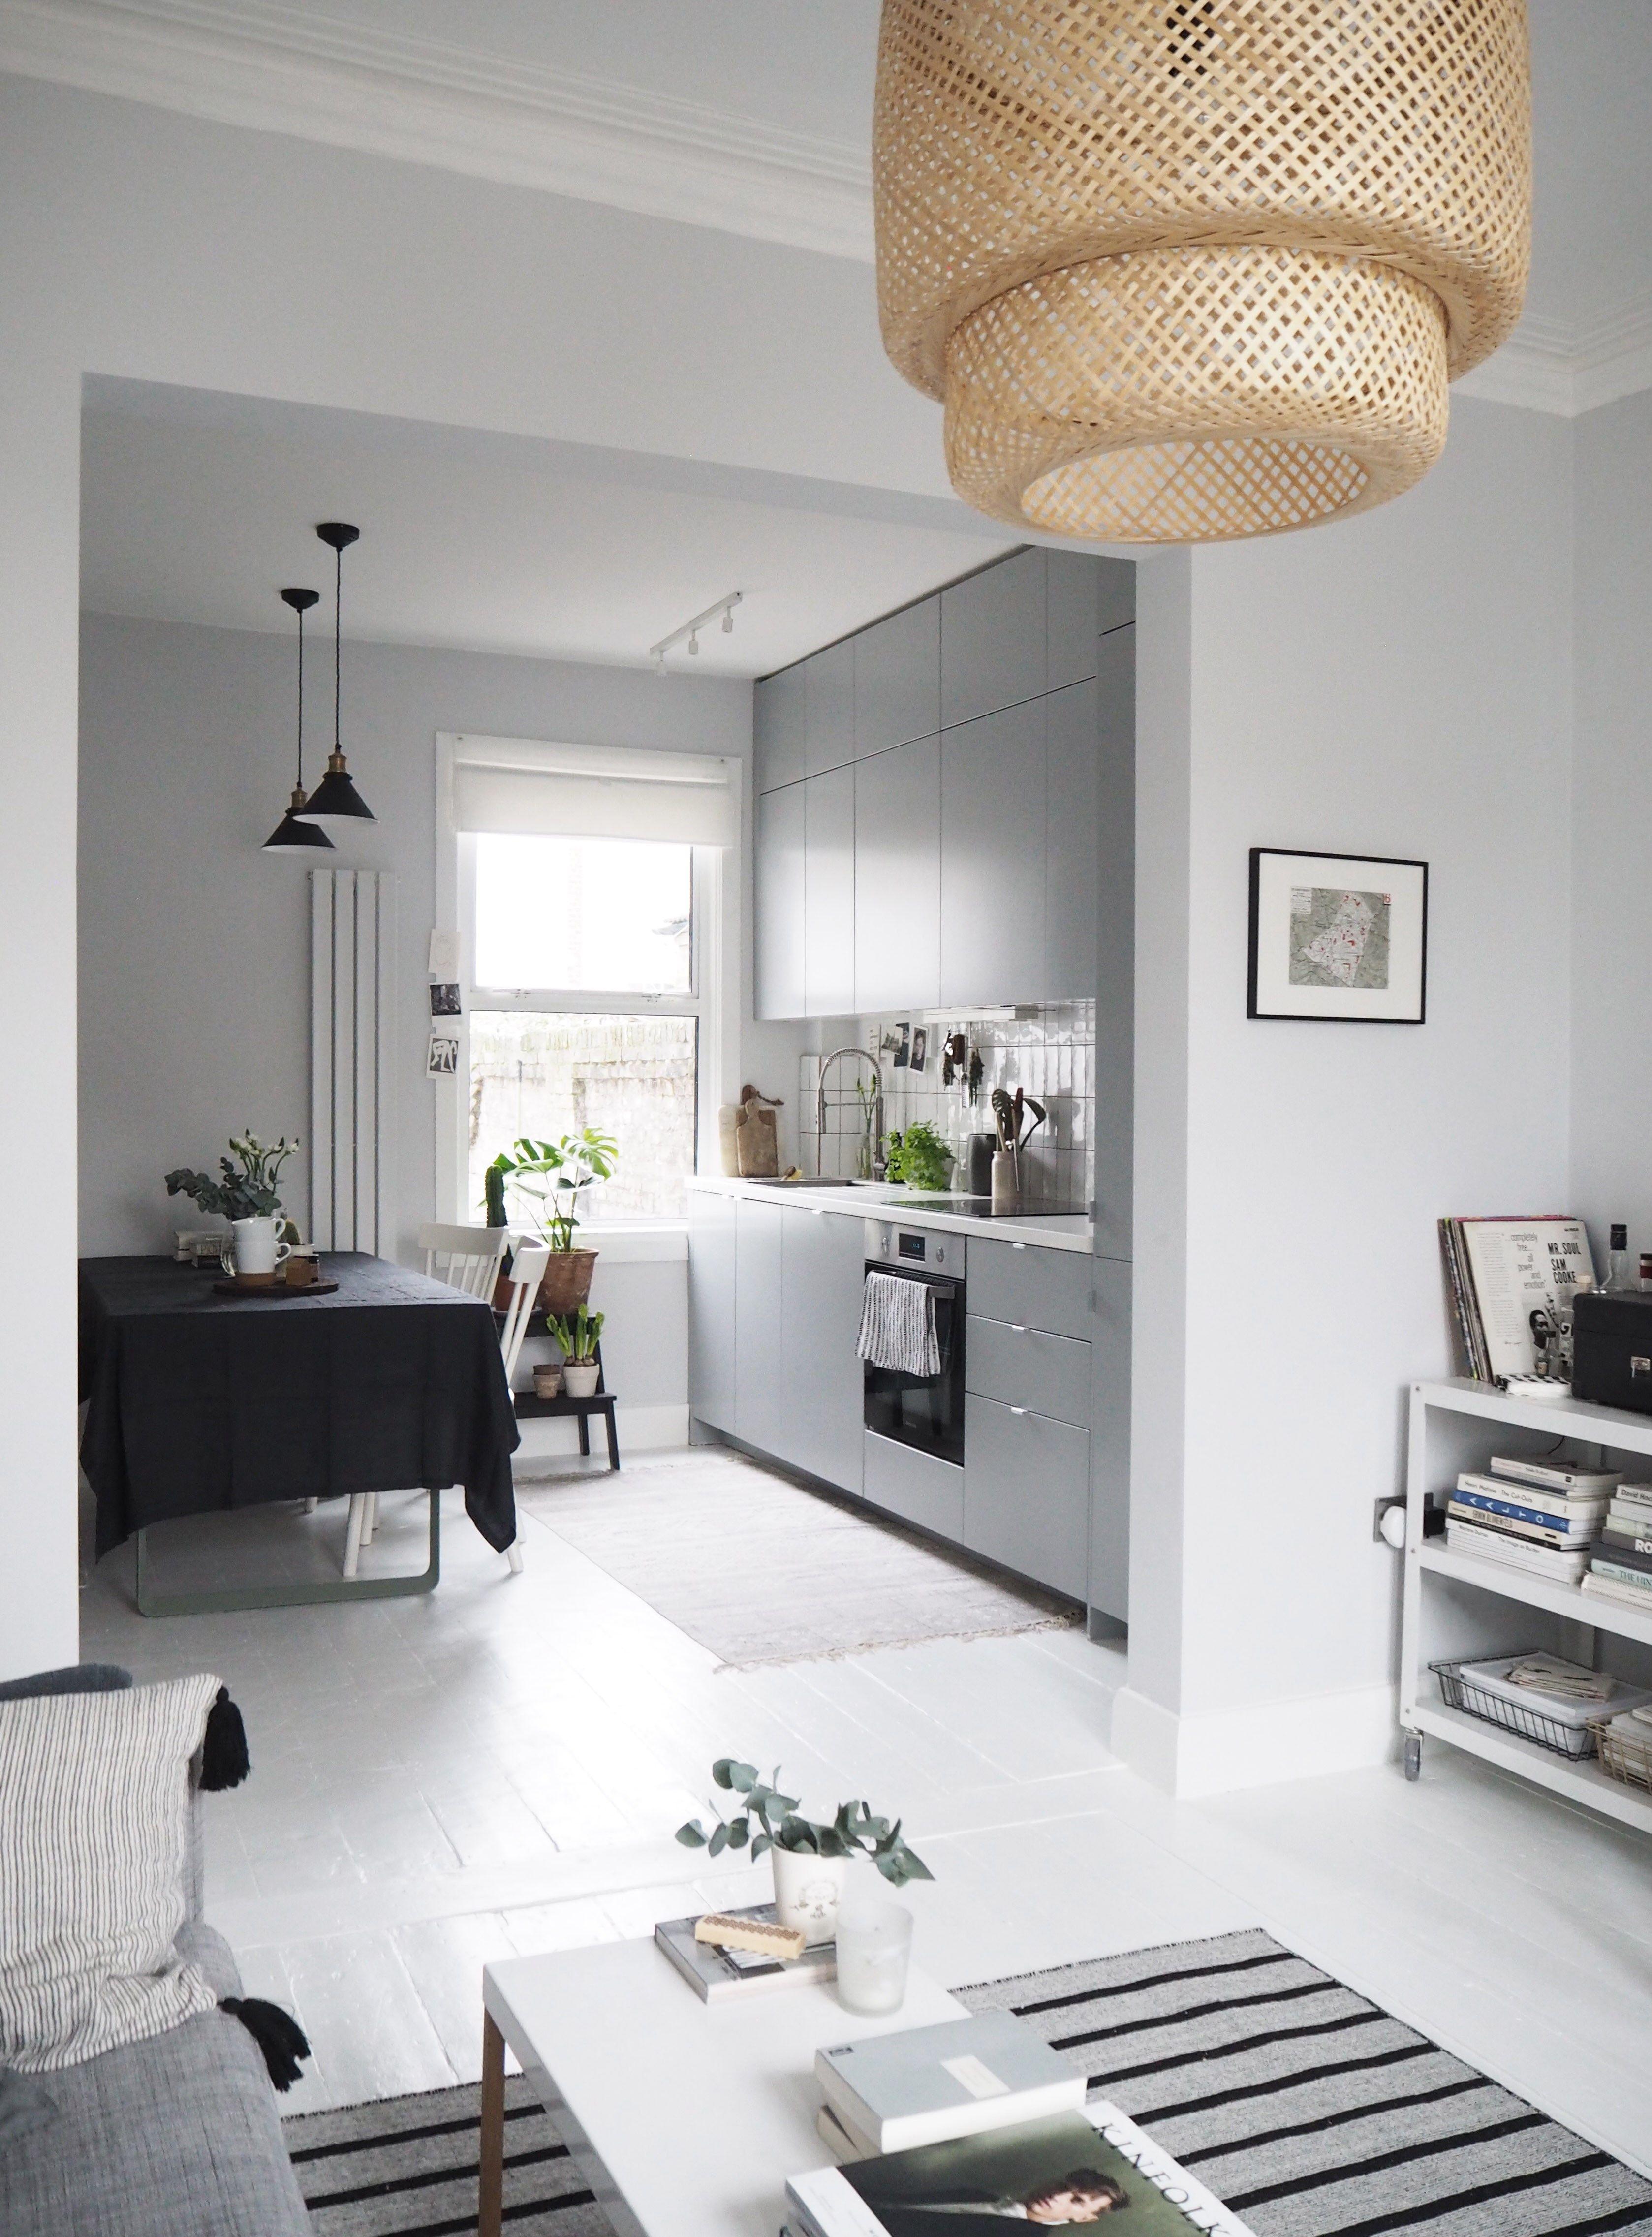 Funky Ikea Grey Kitchen Frieze - Kitchen Cabinets | Ideas ...